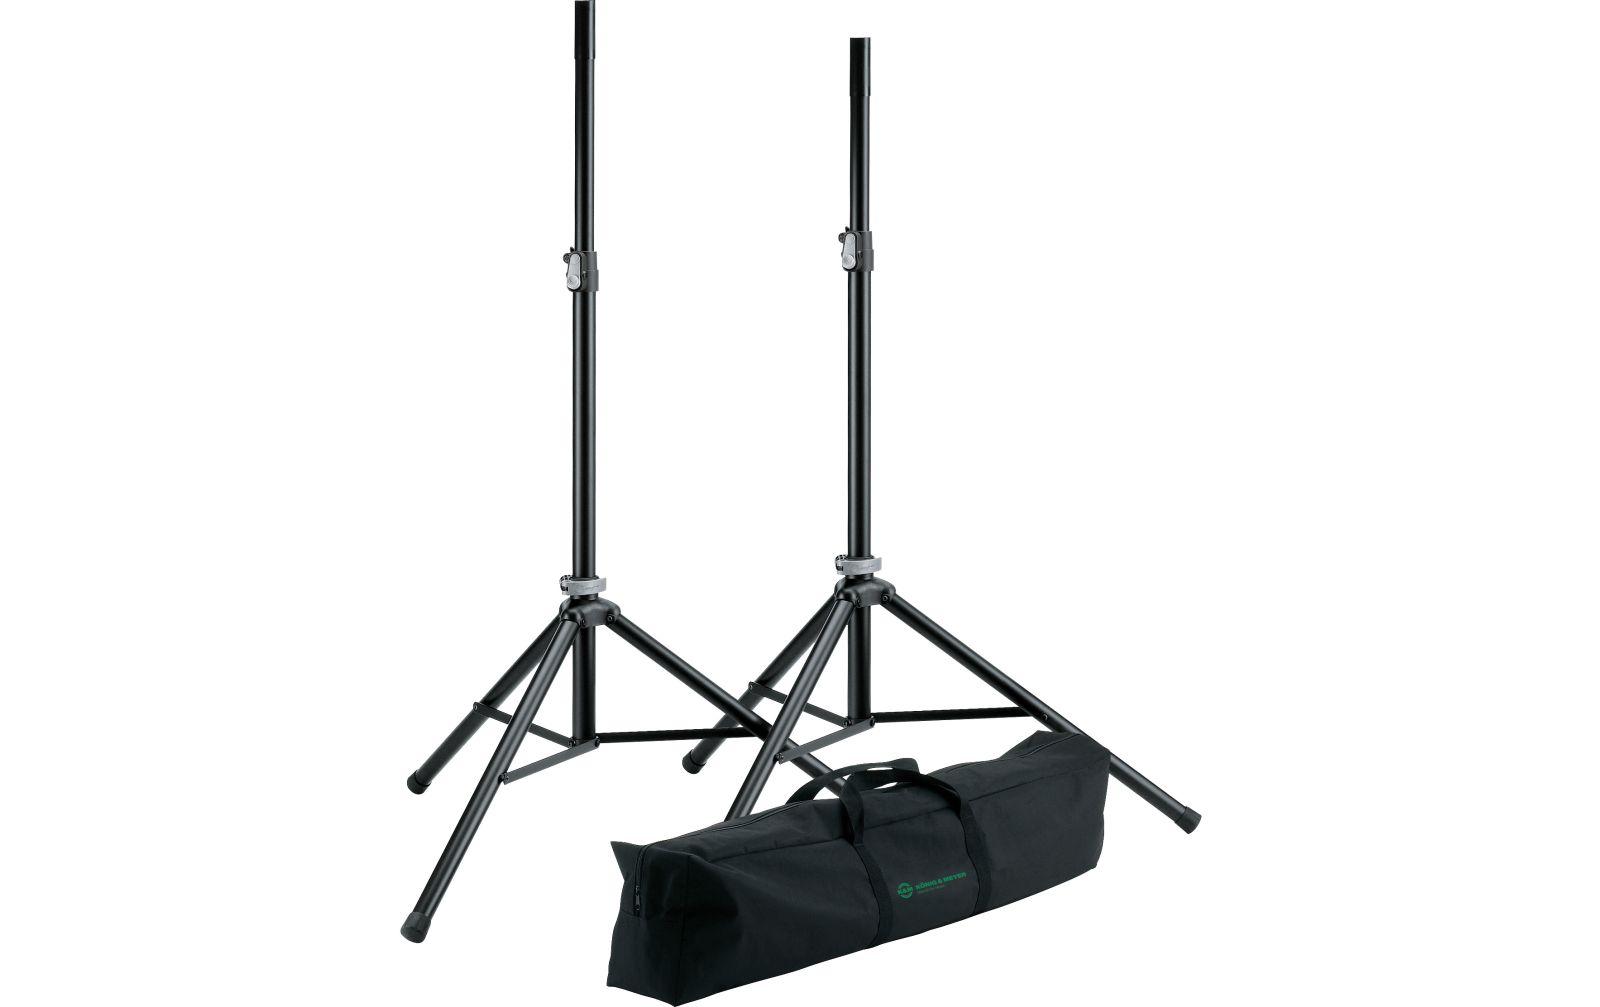 k-m-21449-boxenstative-im-set-schwarz